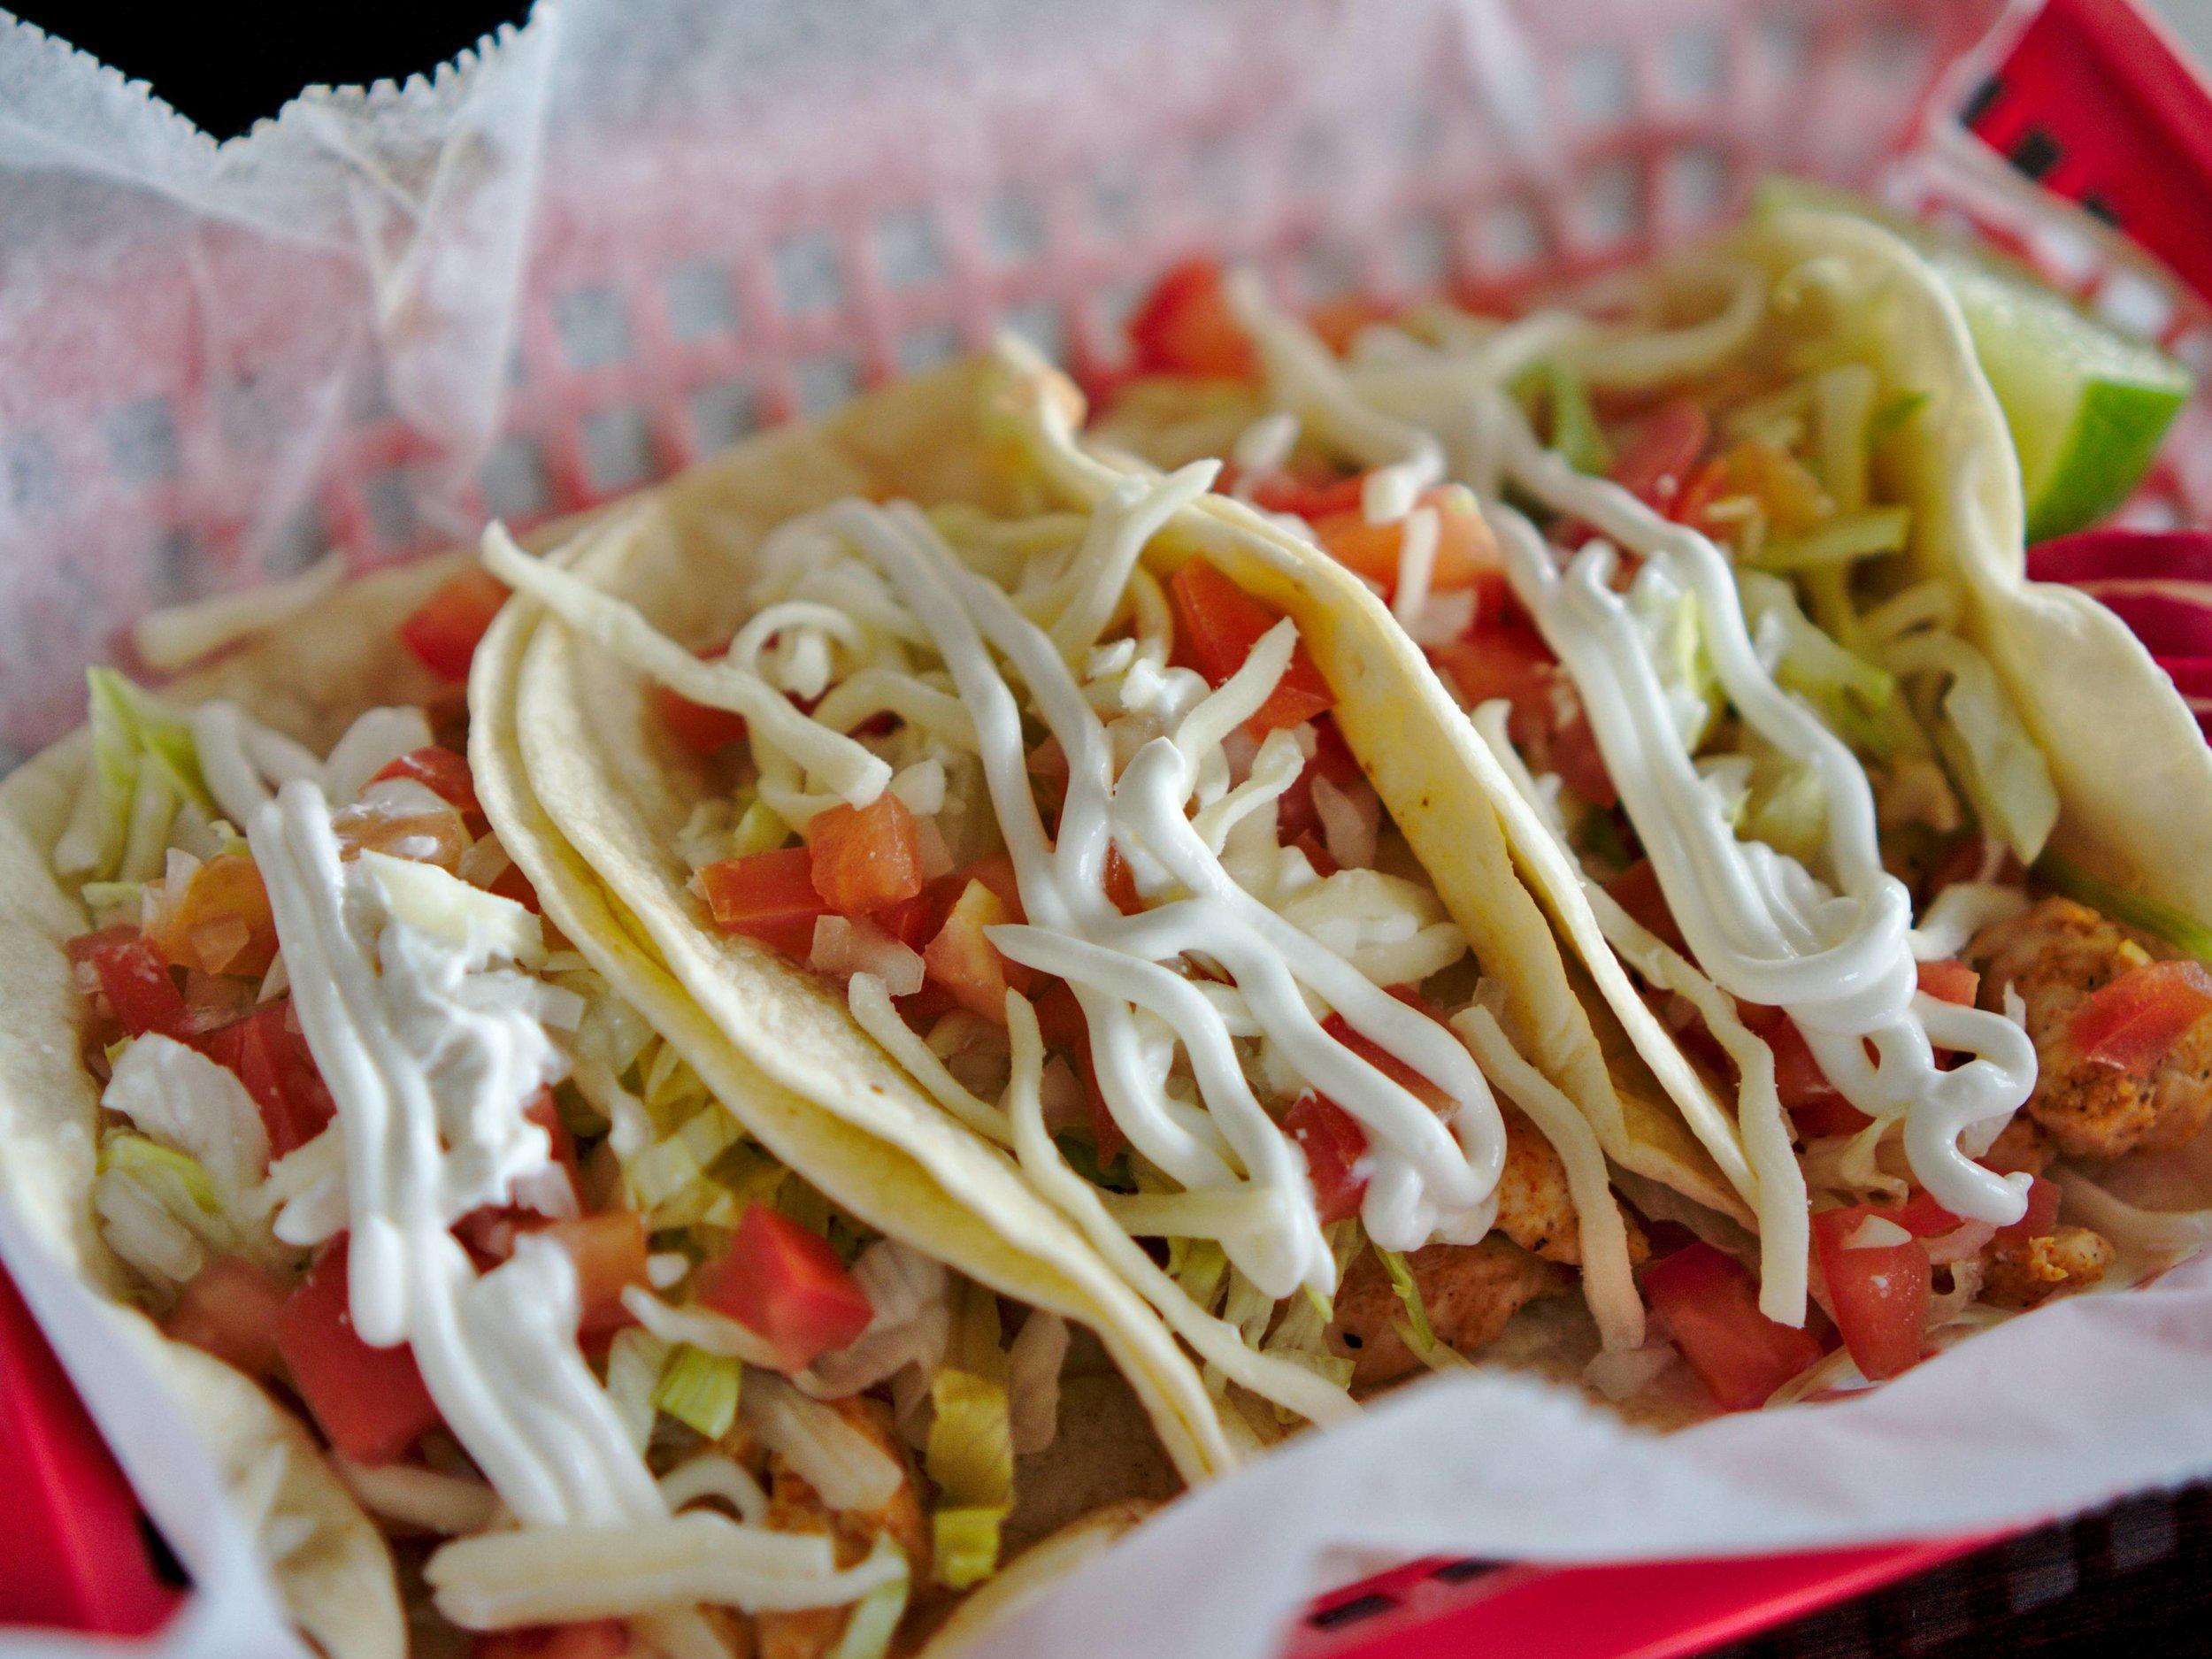 Chicken Flour Tacos